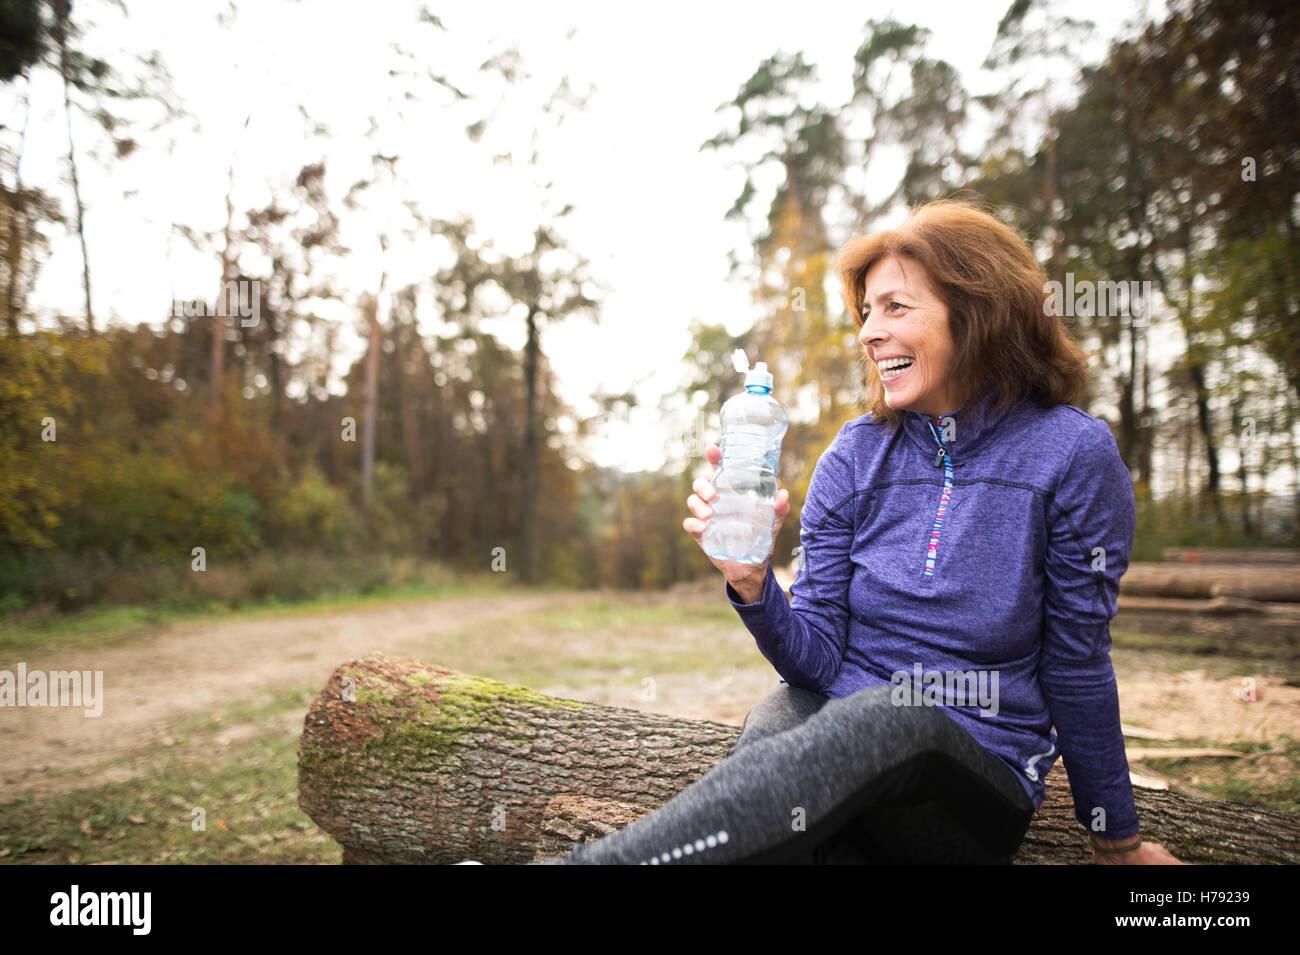 Senior runner sitting on wooden logs, resting, drinking water. - Stock Image